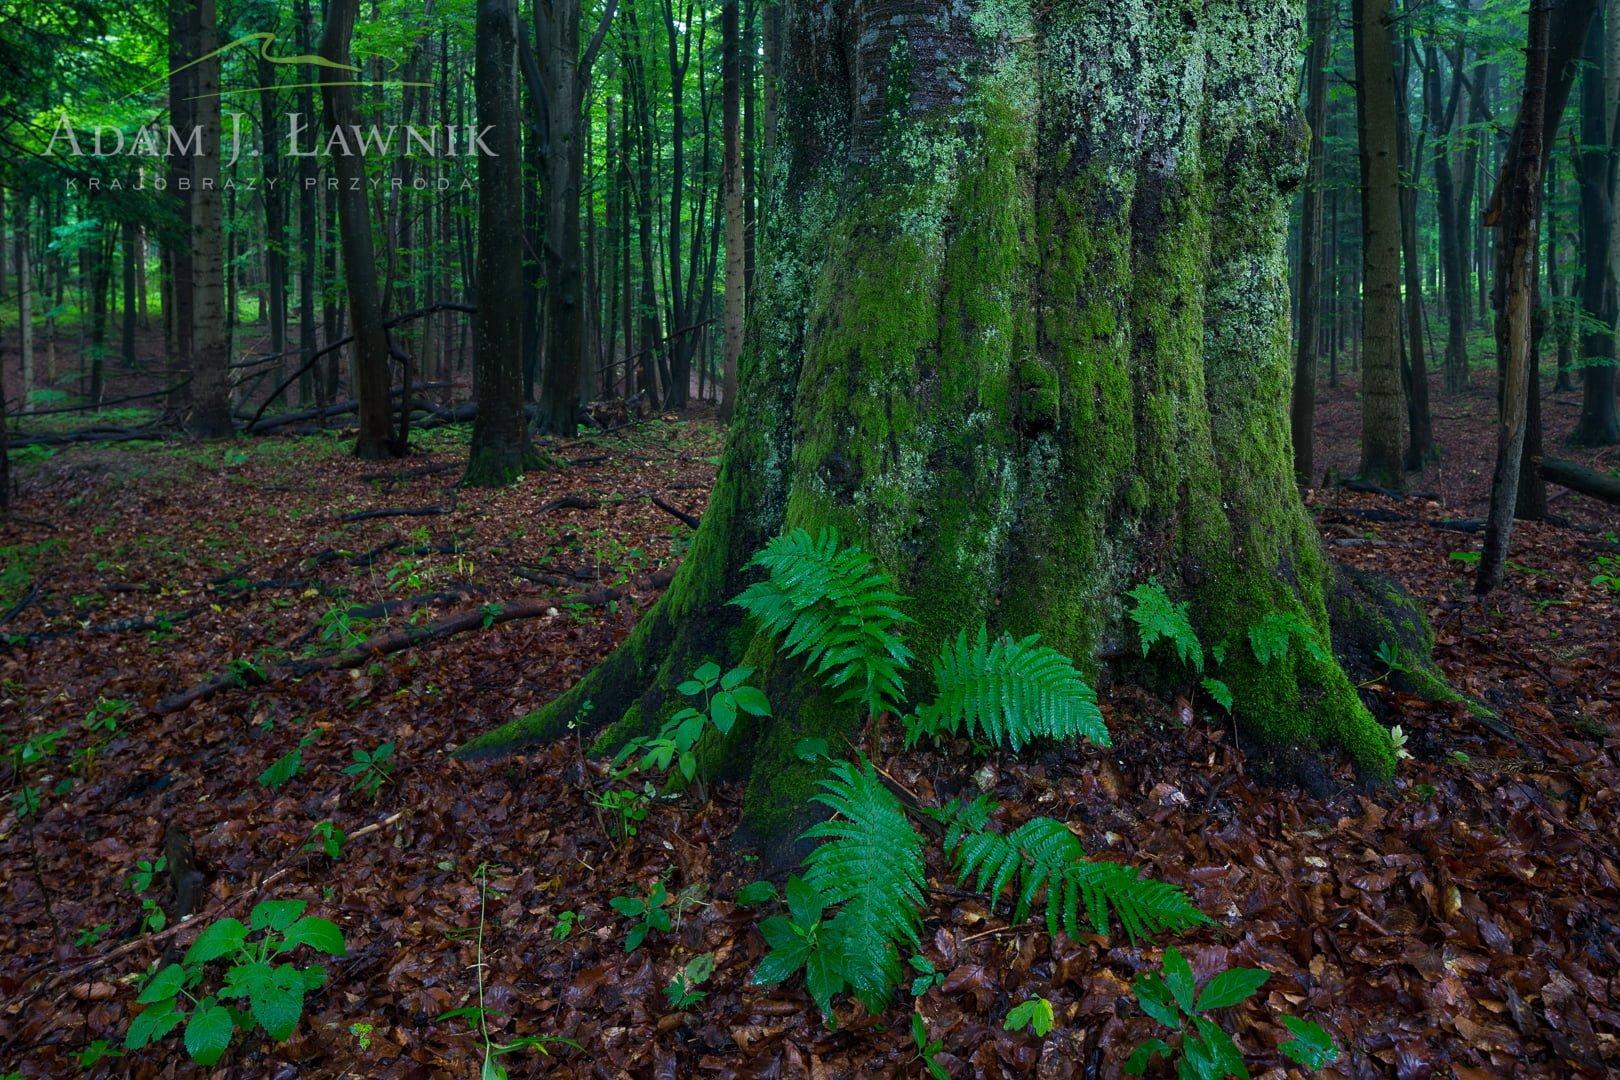 Turnica National Park, Poland 1606-00341C